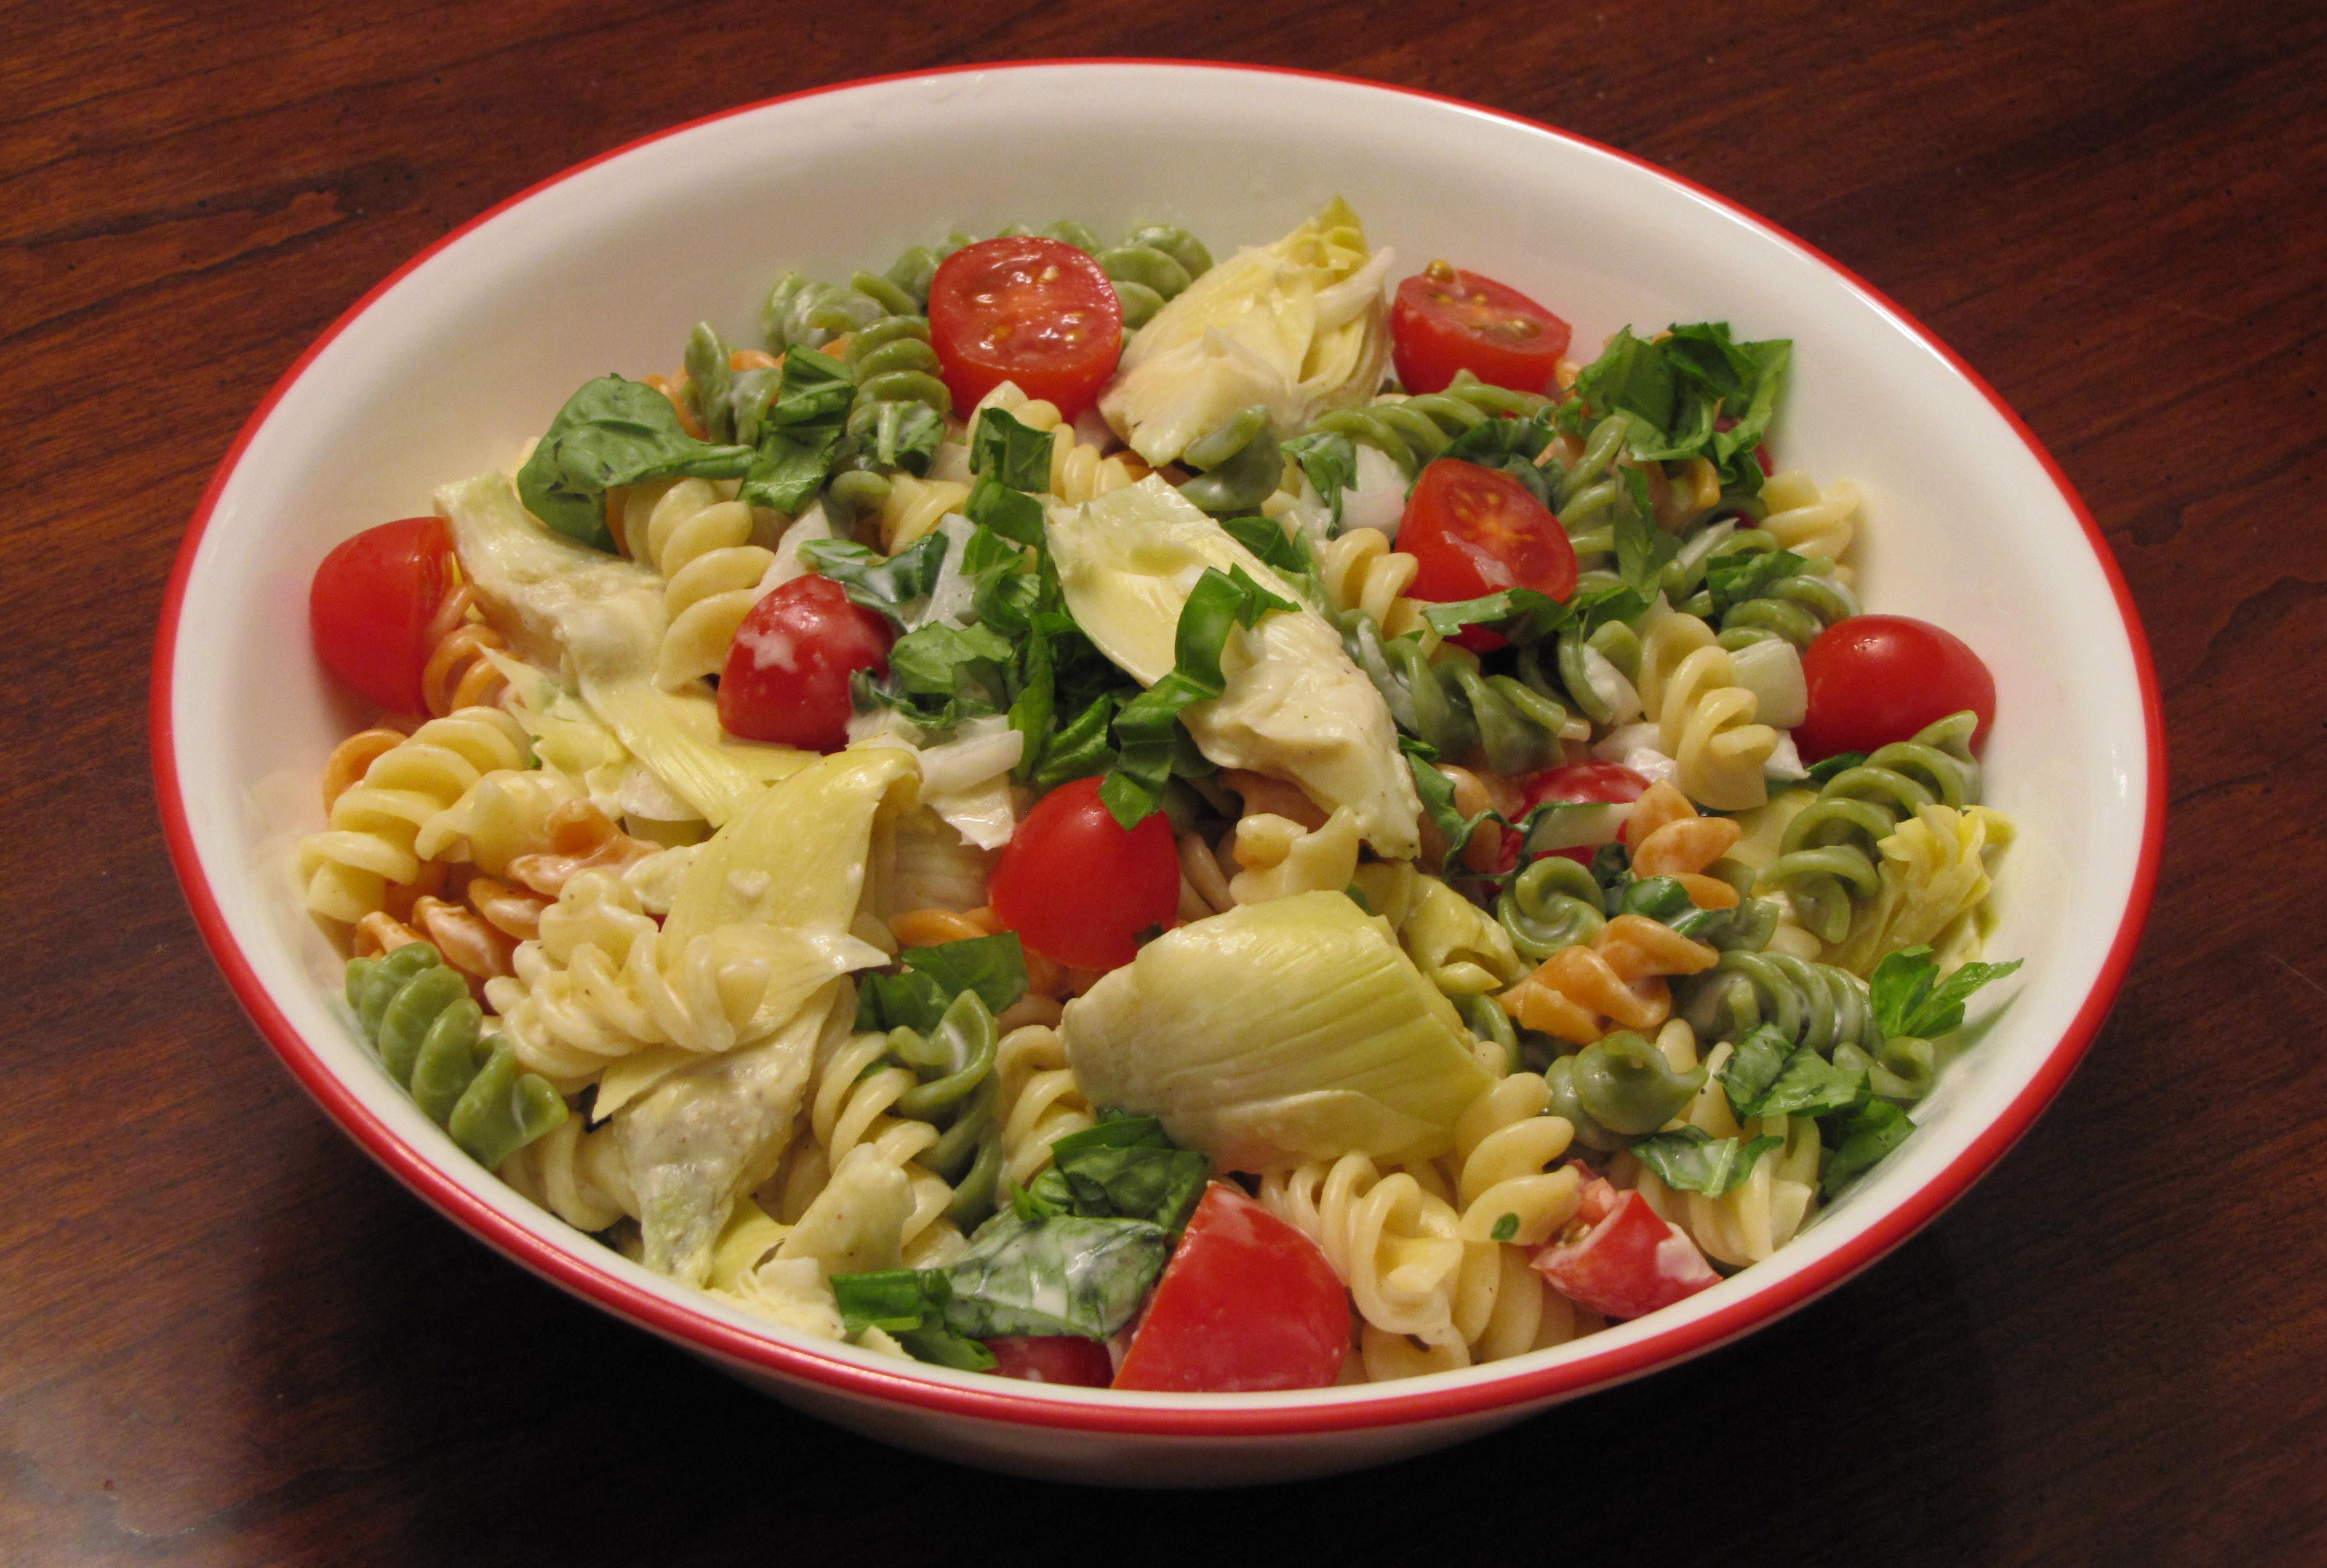 Artichoke Pasta Salad  Artichoke Lover's Pasta Salad – VegCharlotte